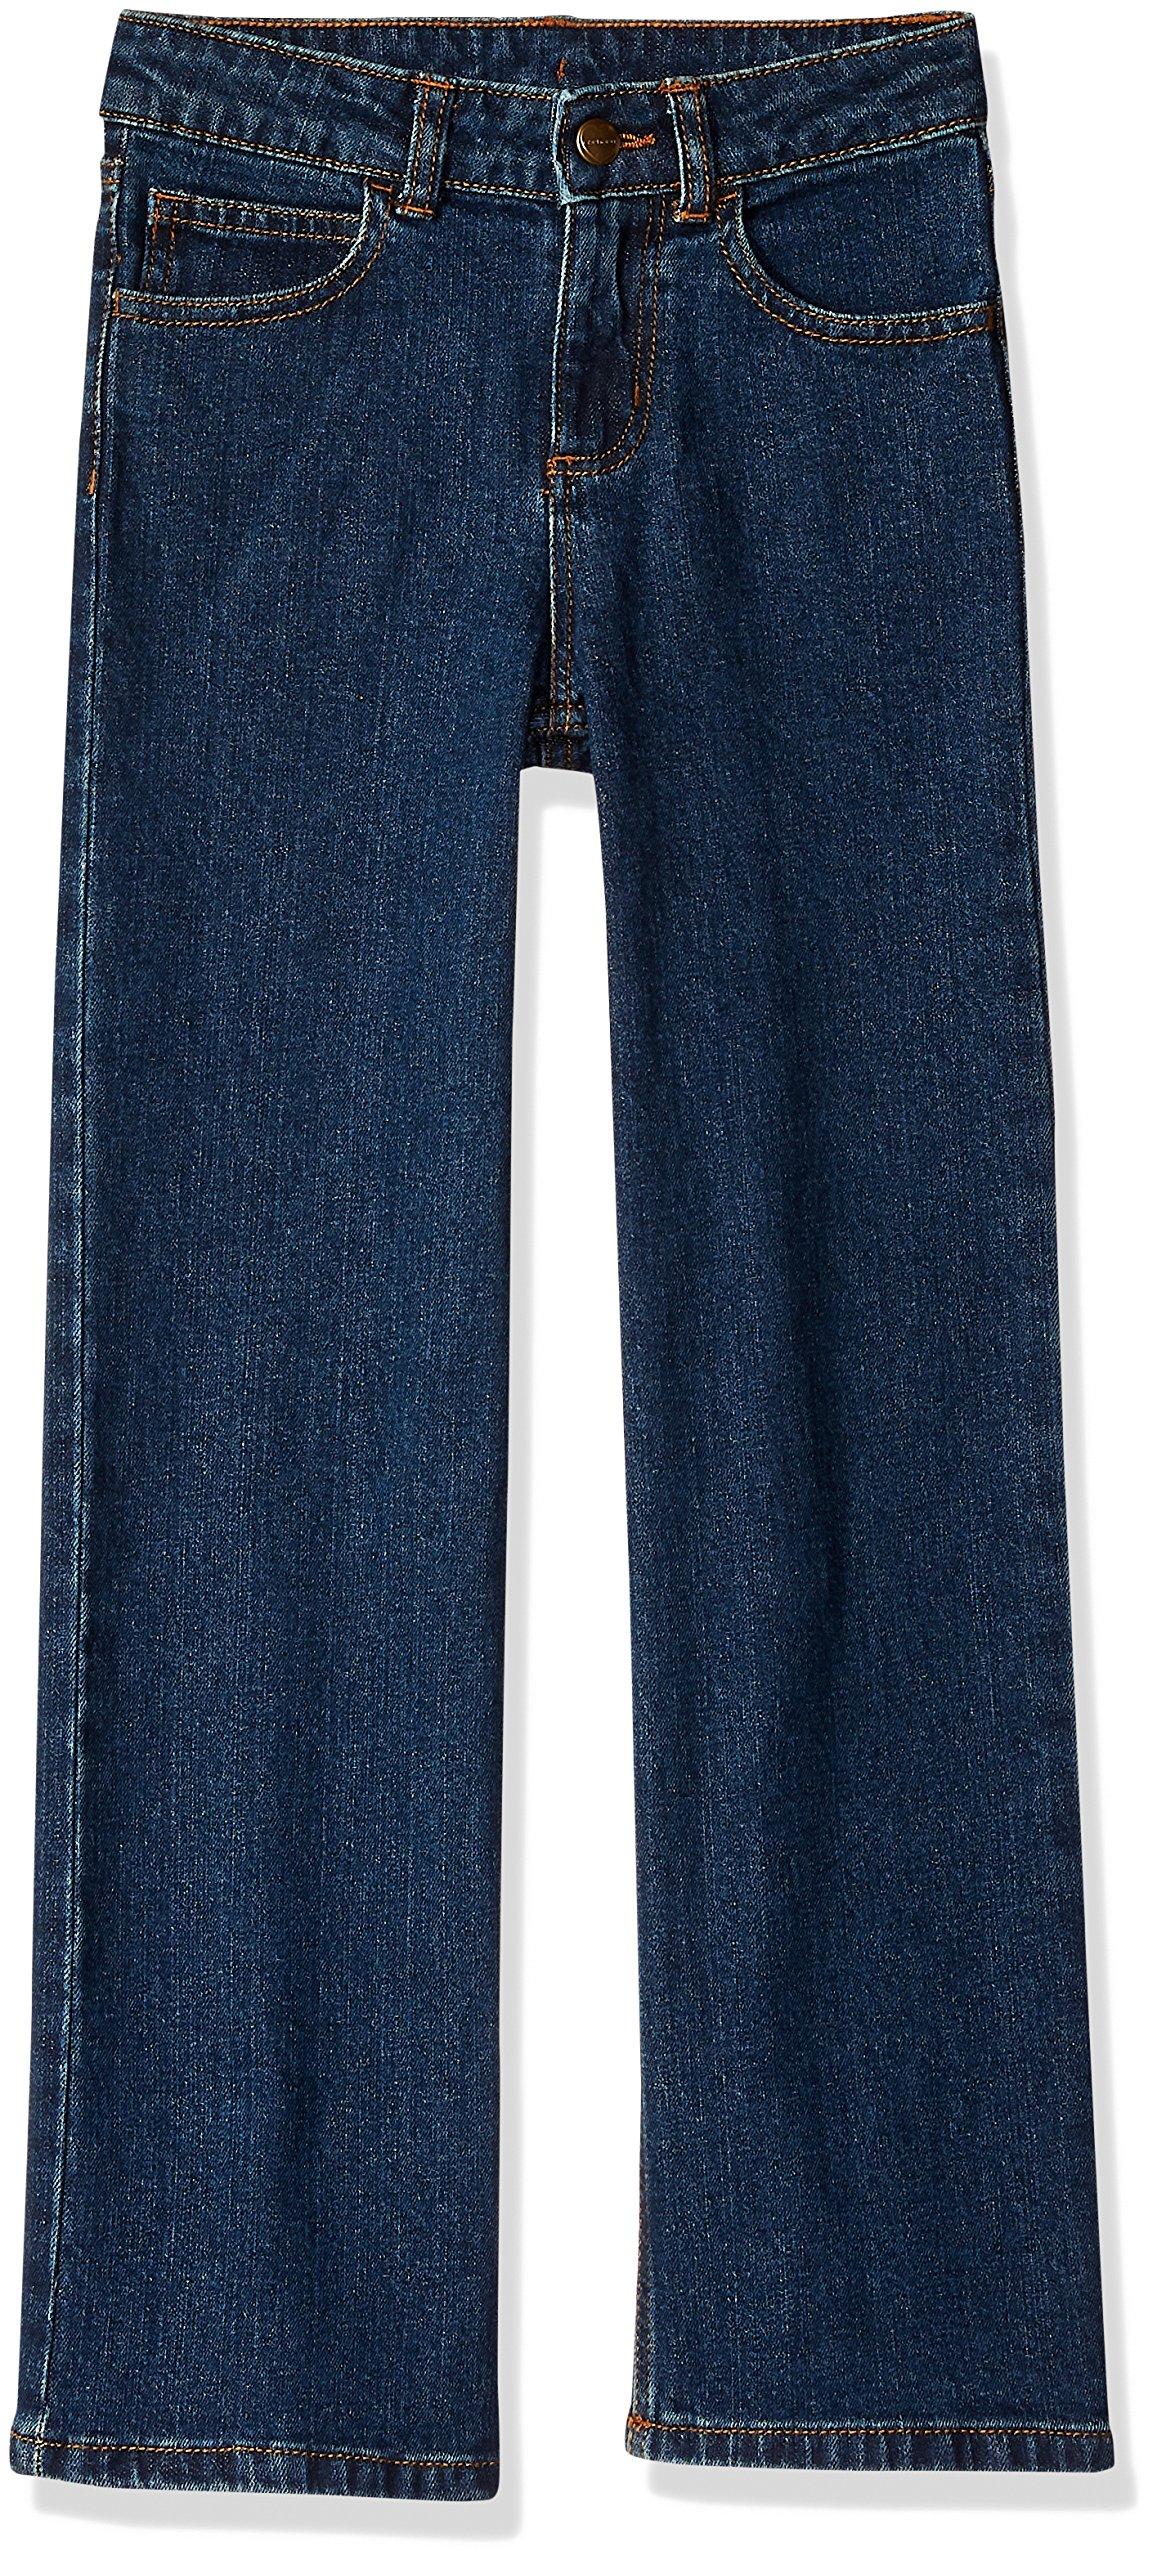 Carhartt Big Girls' Denim 5 Pocket Jean, Dark Blue, 10